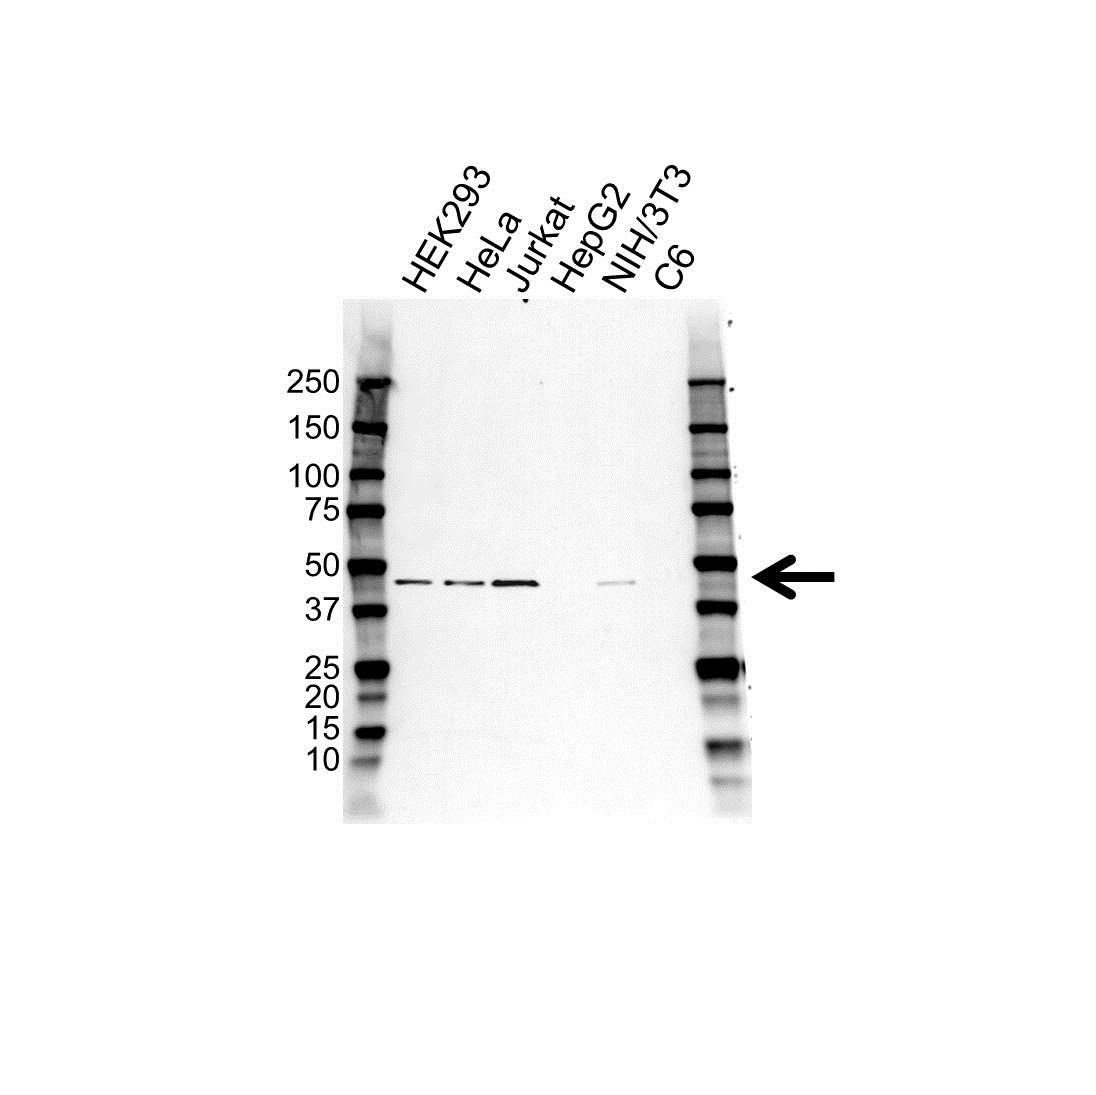 SLC39A6 Antibody (PrecisionAb<sup>TM</sup> Antibody) gallery image 1